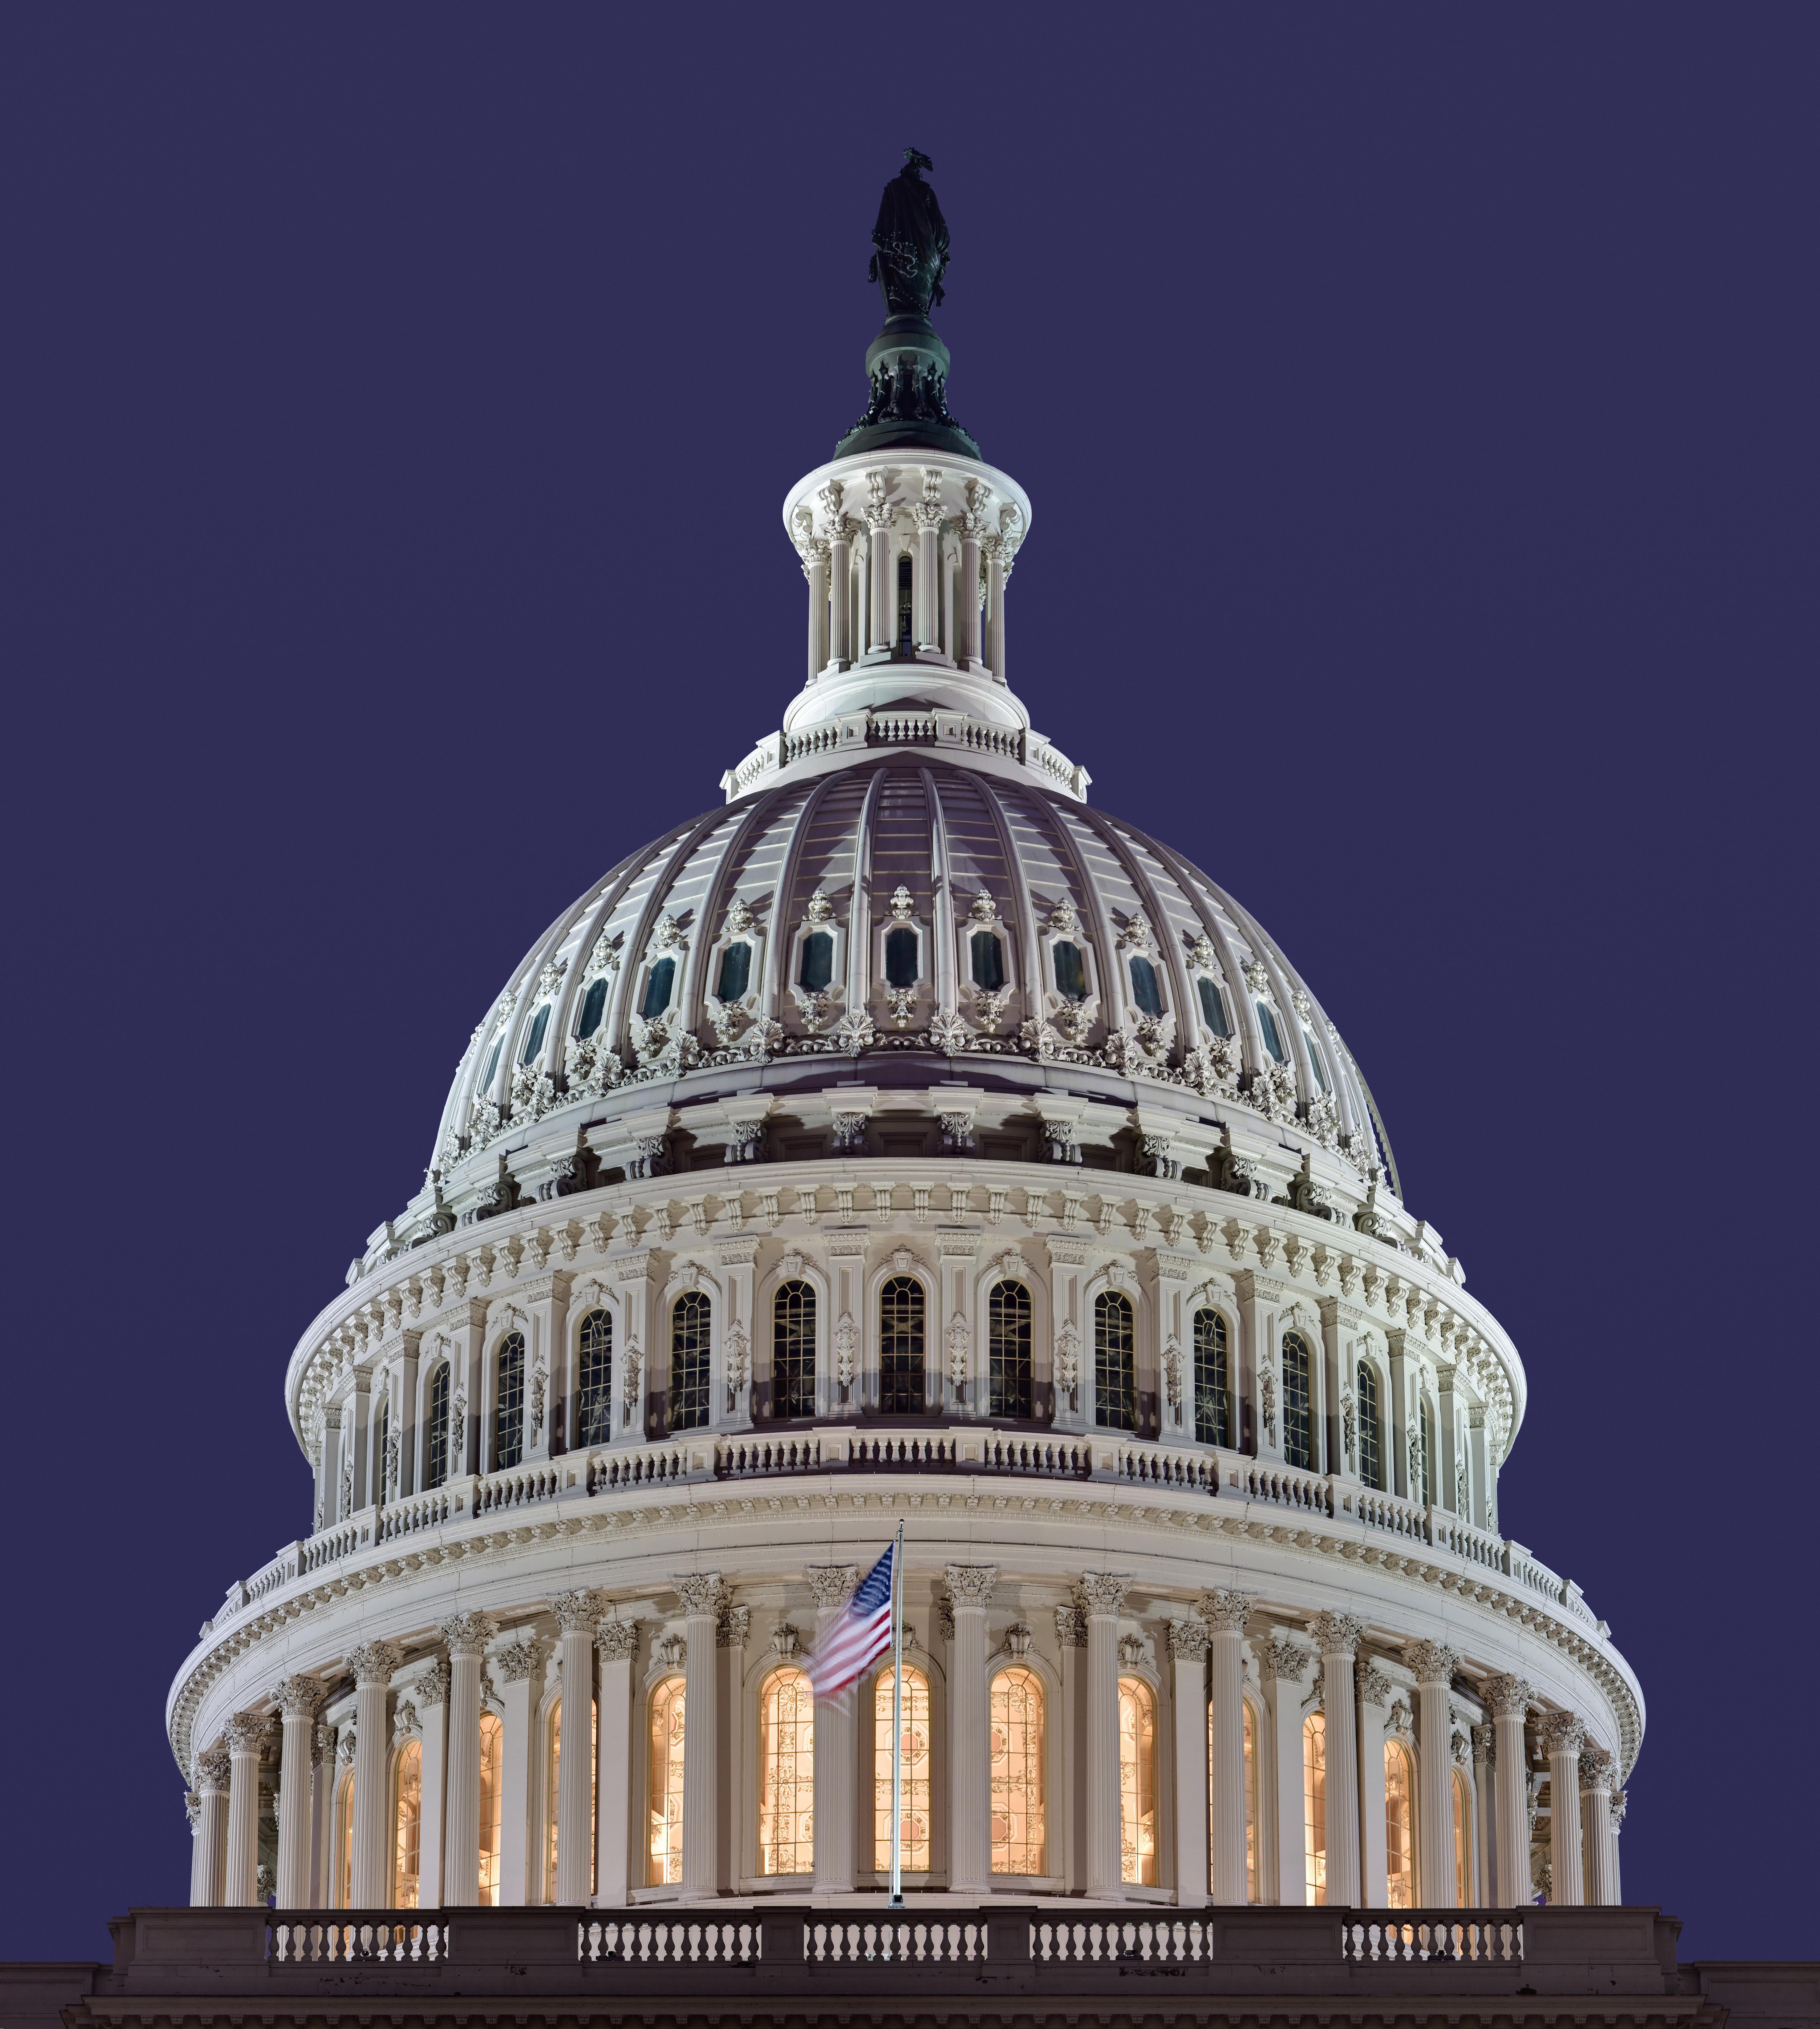 The dome of the US Capitol building. Français ...